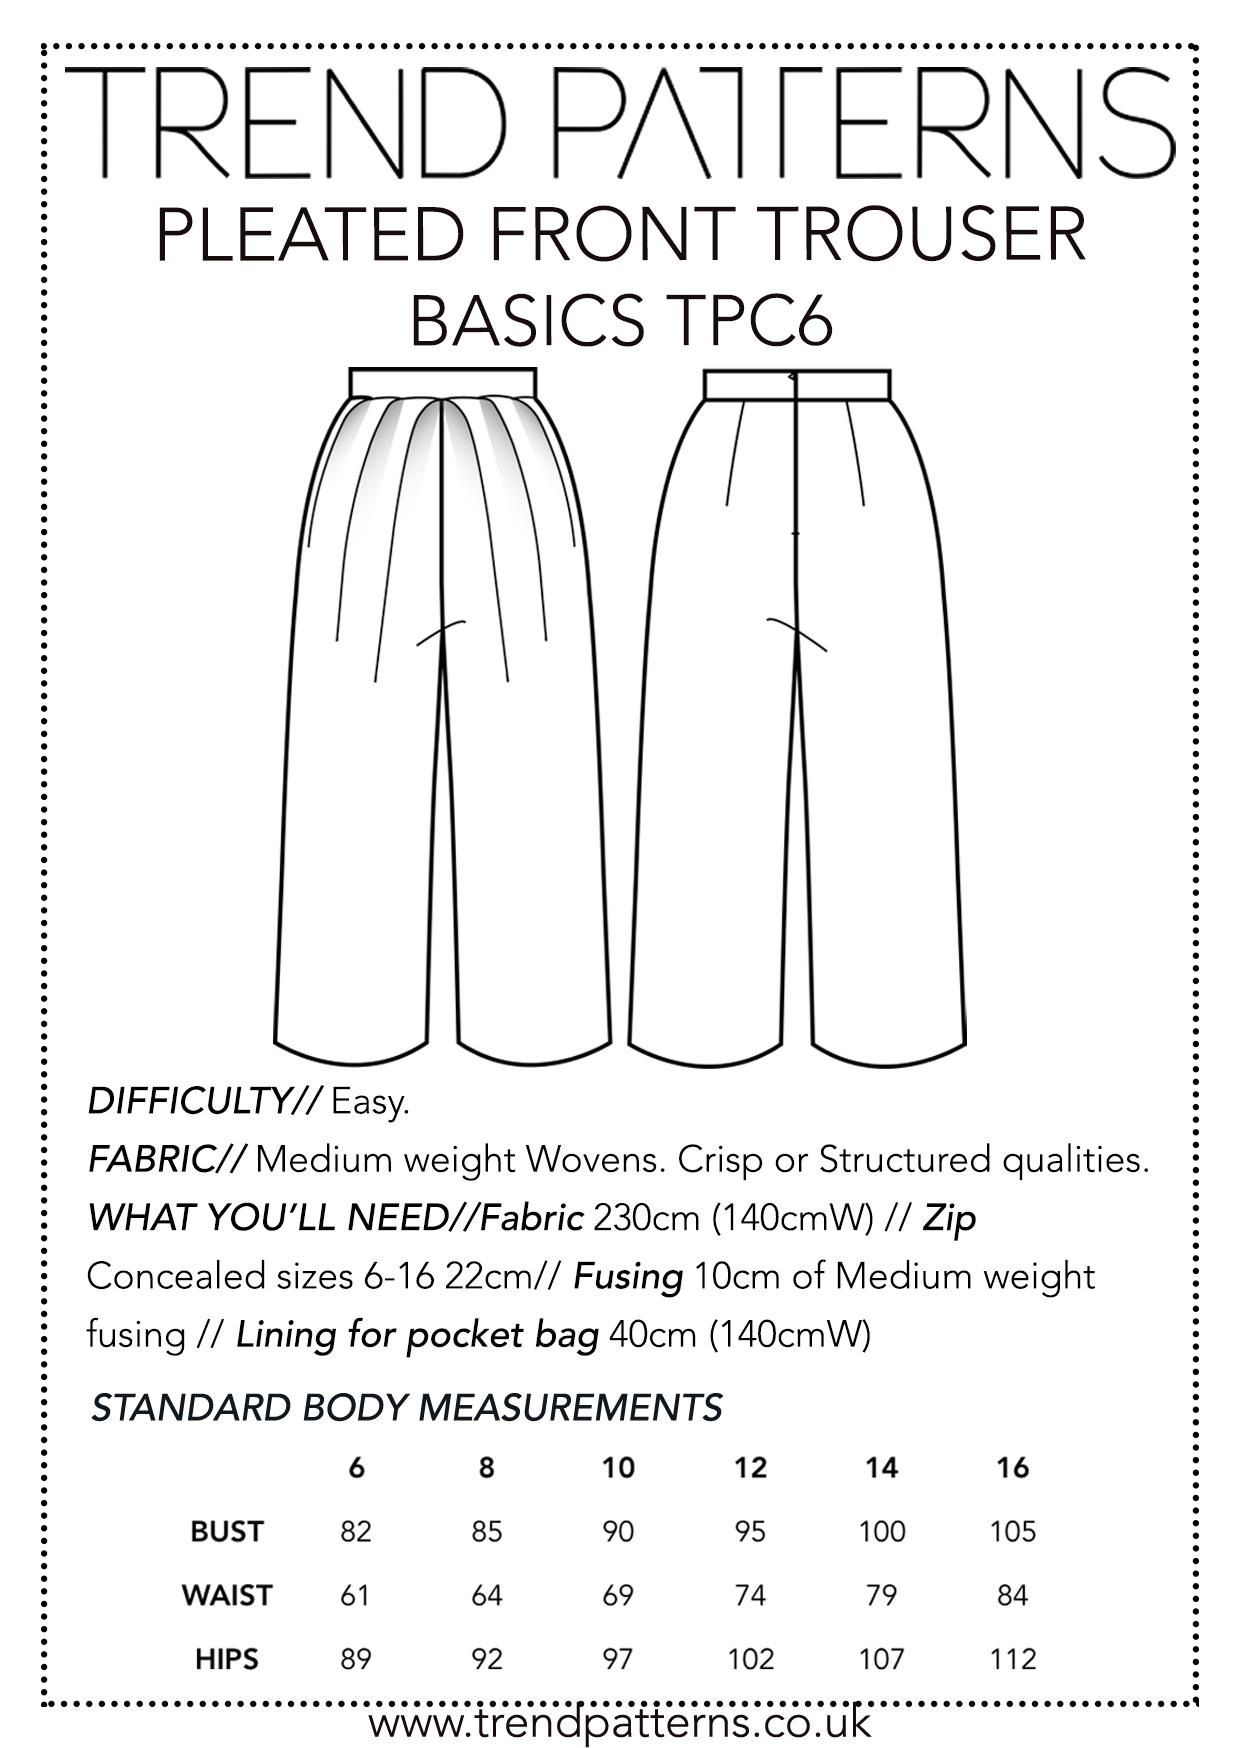 tpc6 back sticker.jpg